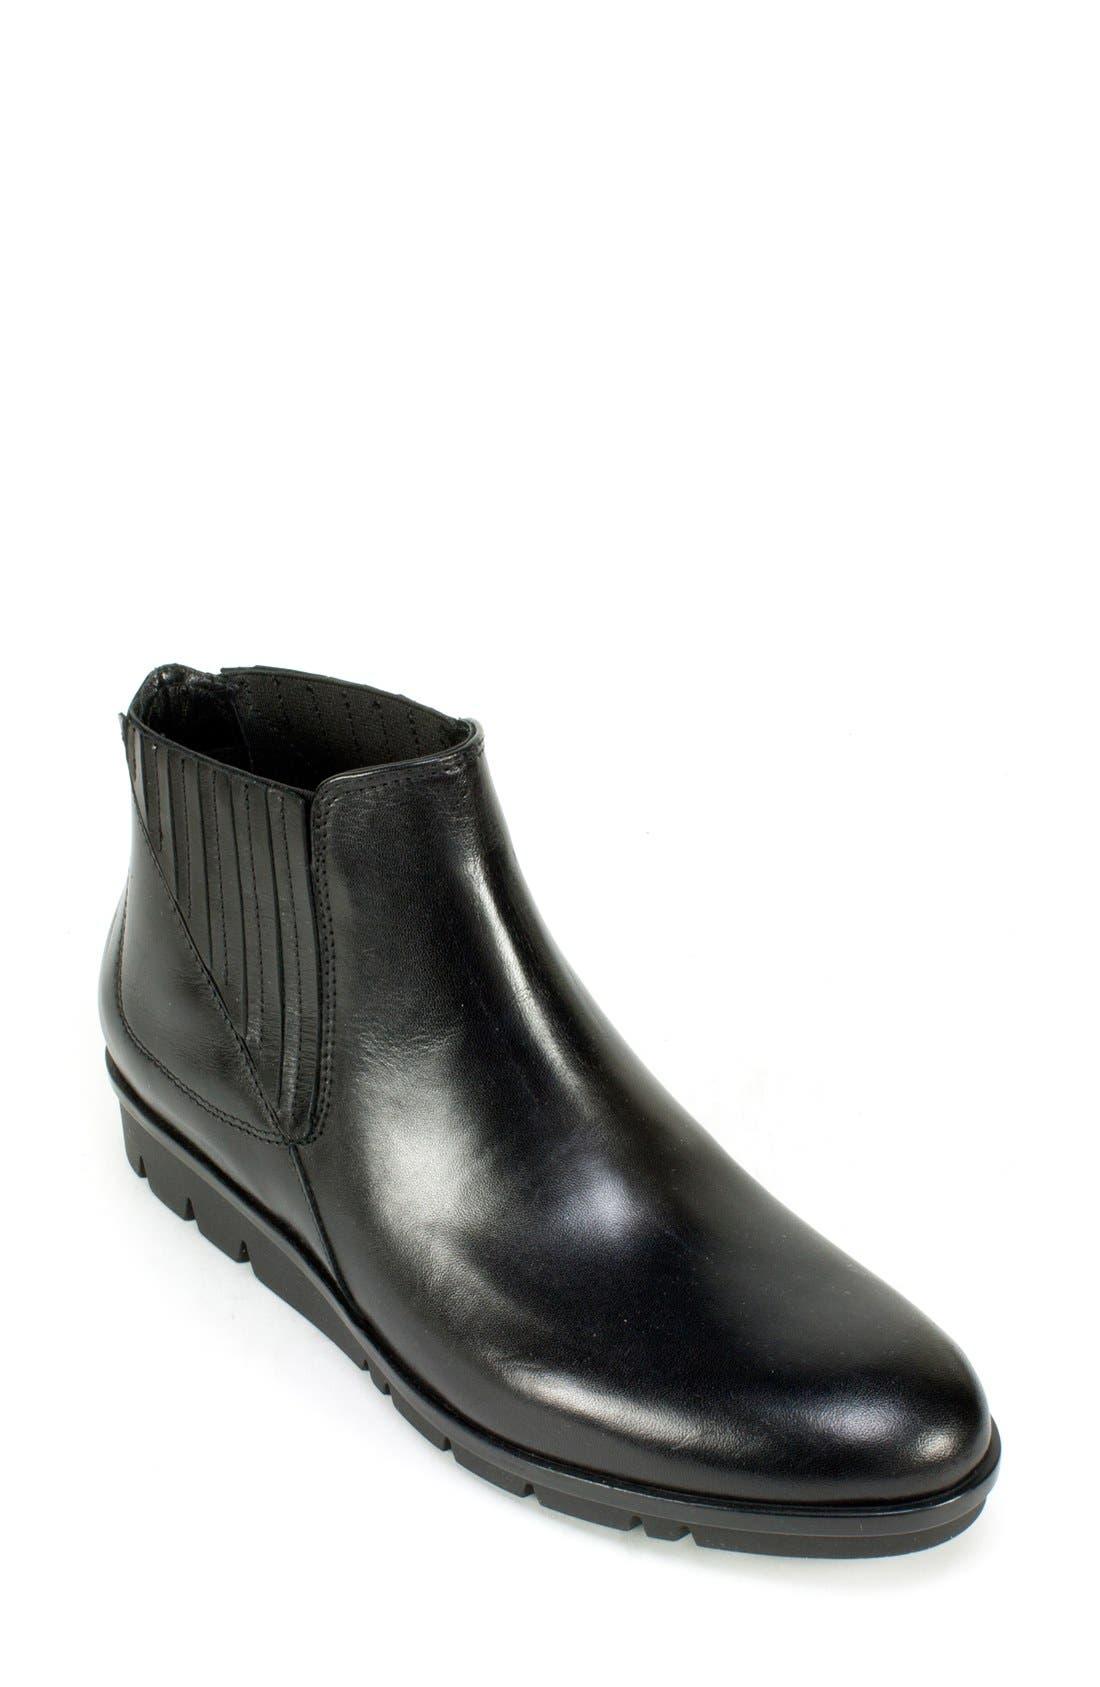 Alternate Image 1 Selected - Summit 'Whitney' Chelsea Boot (Women)